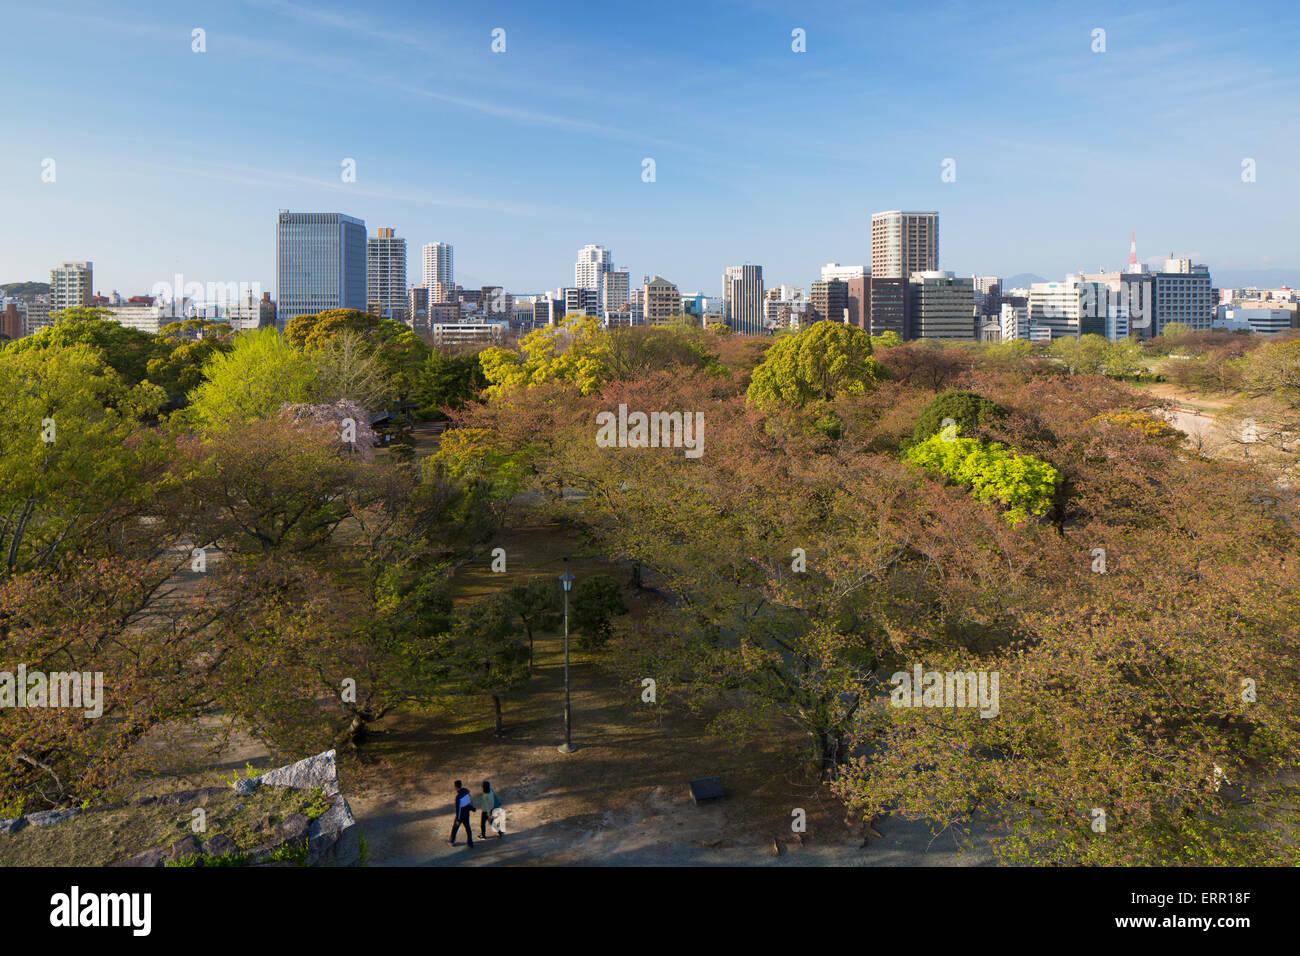 City skyline and Maizuru Park, Fukuoka, Kyushu, Japan - Stock Image